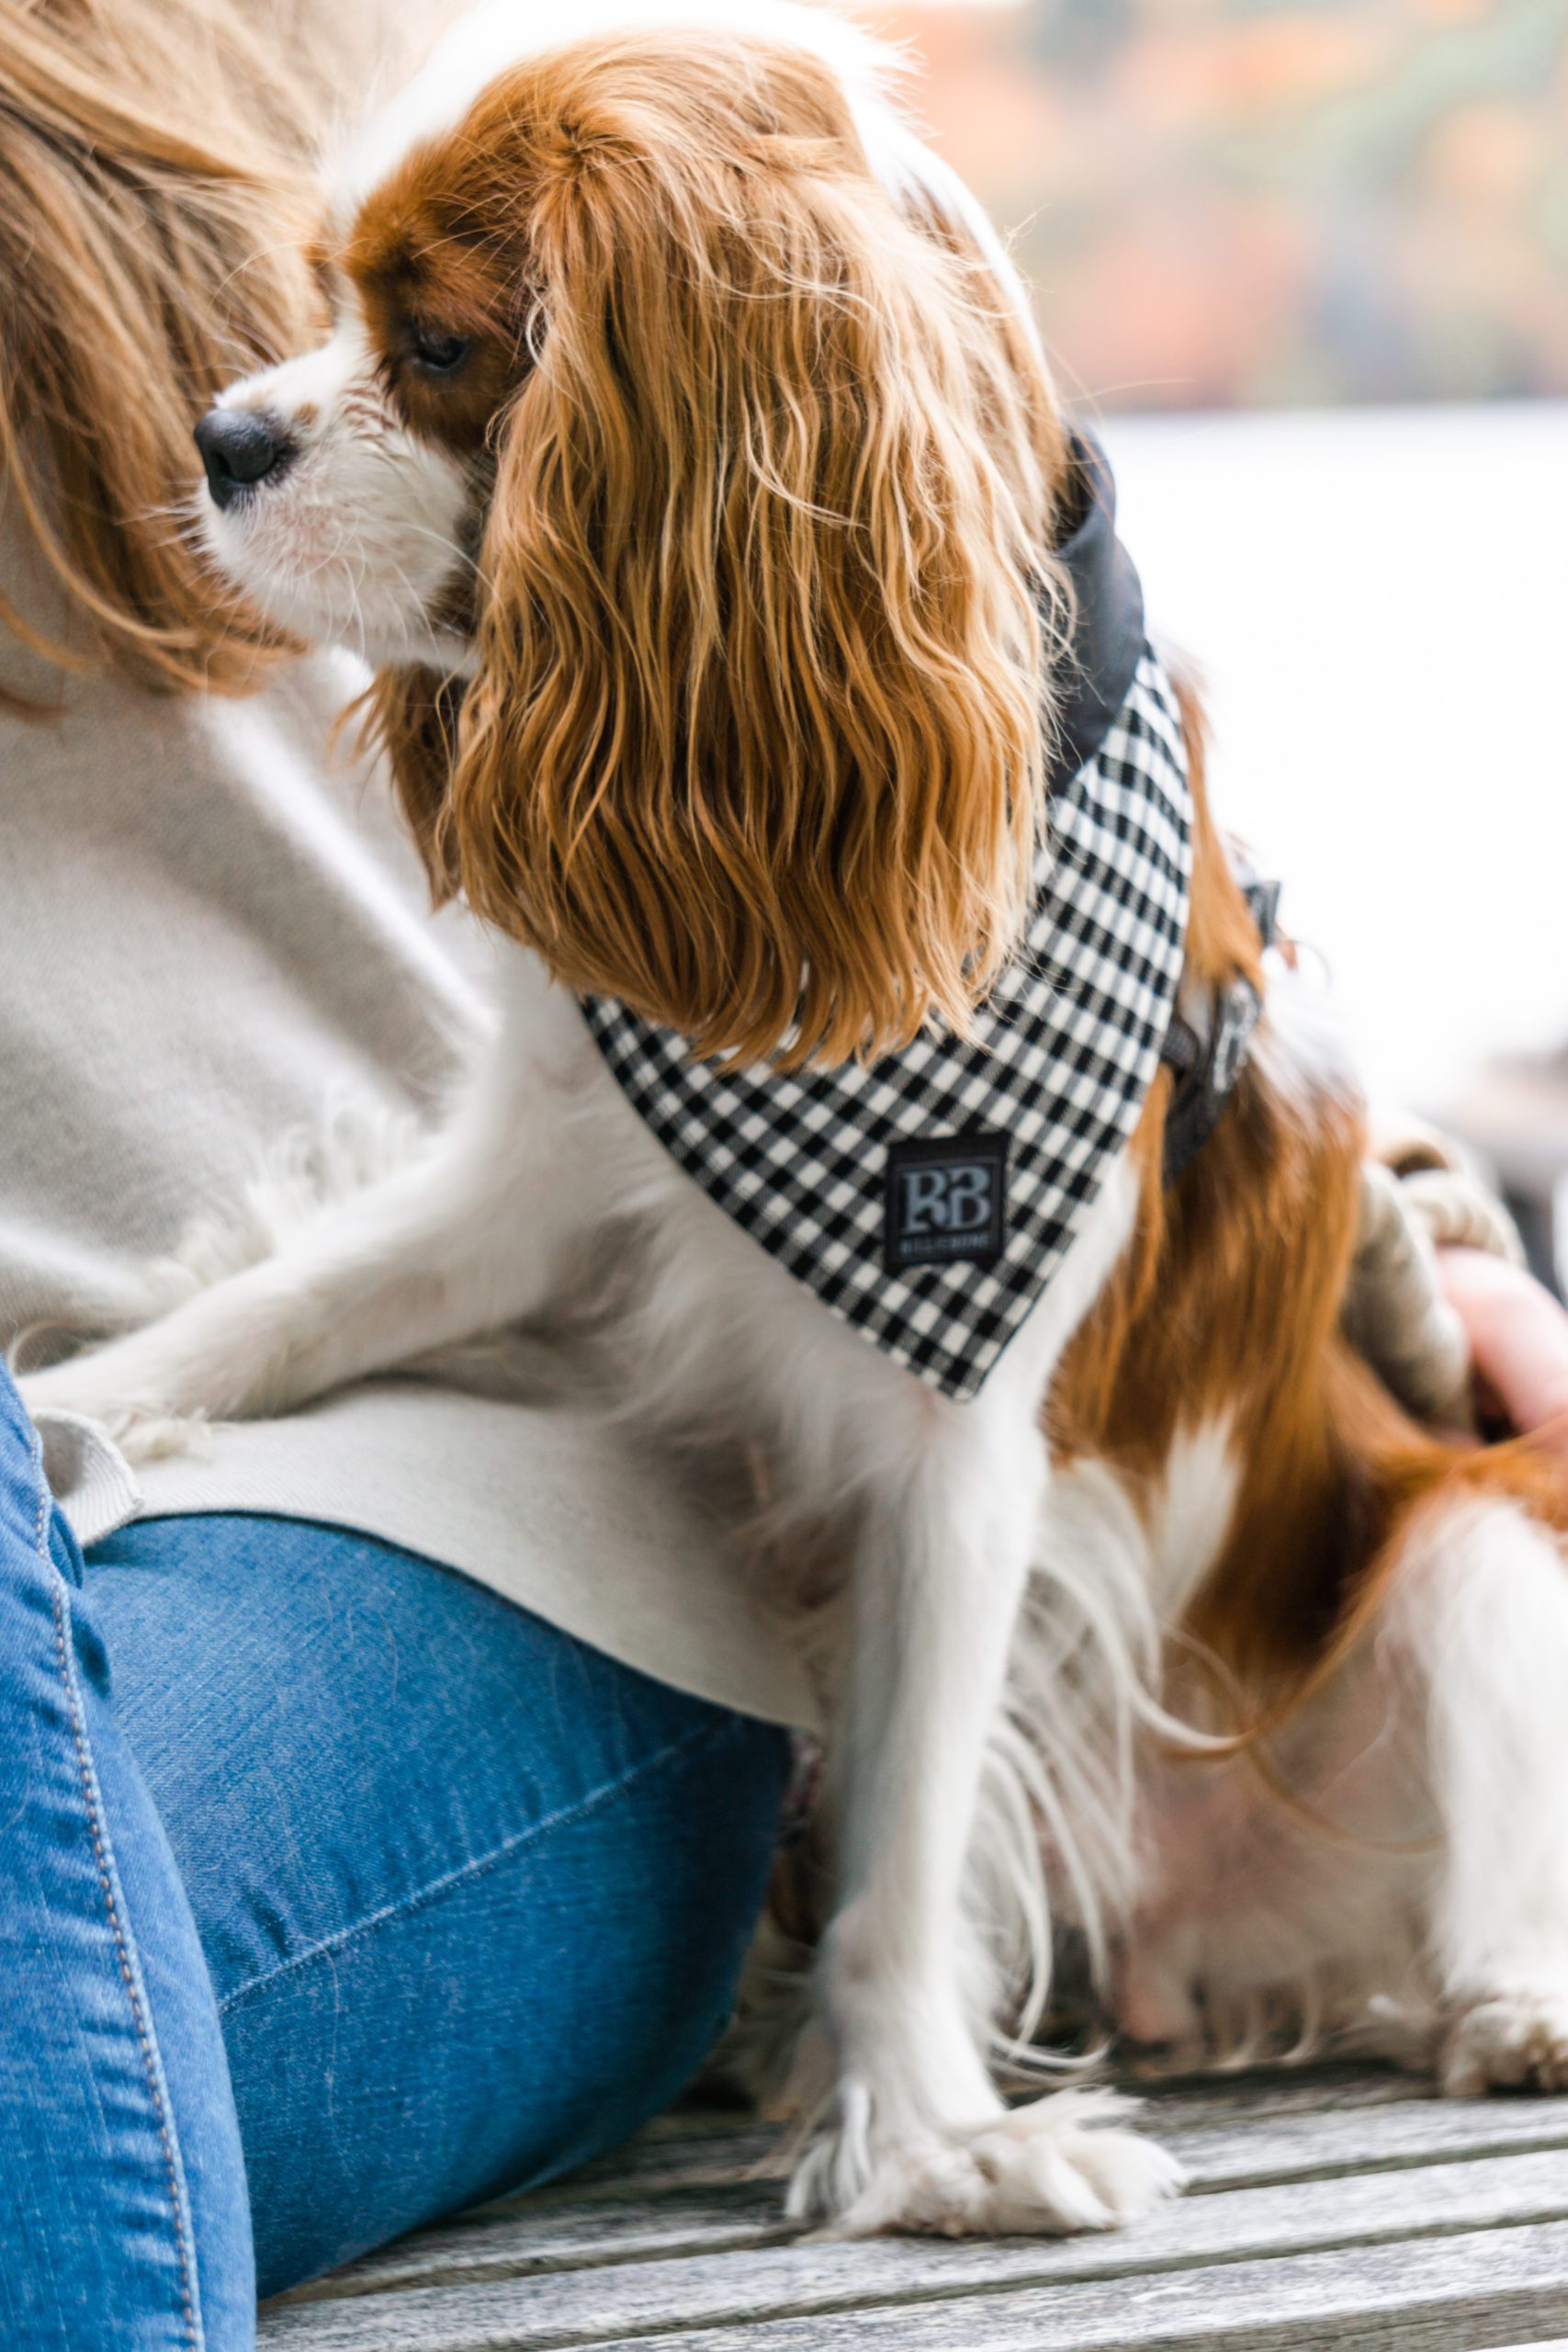 Smol's Closet: Billiebone Dog treats & accessories